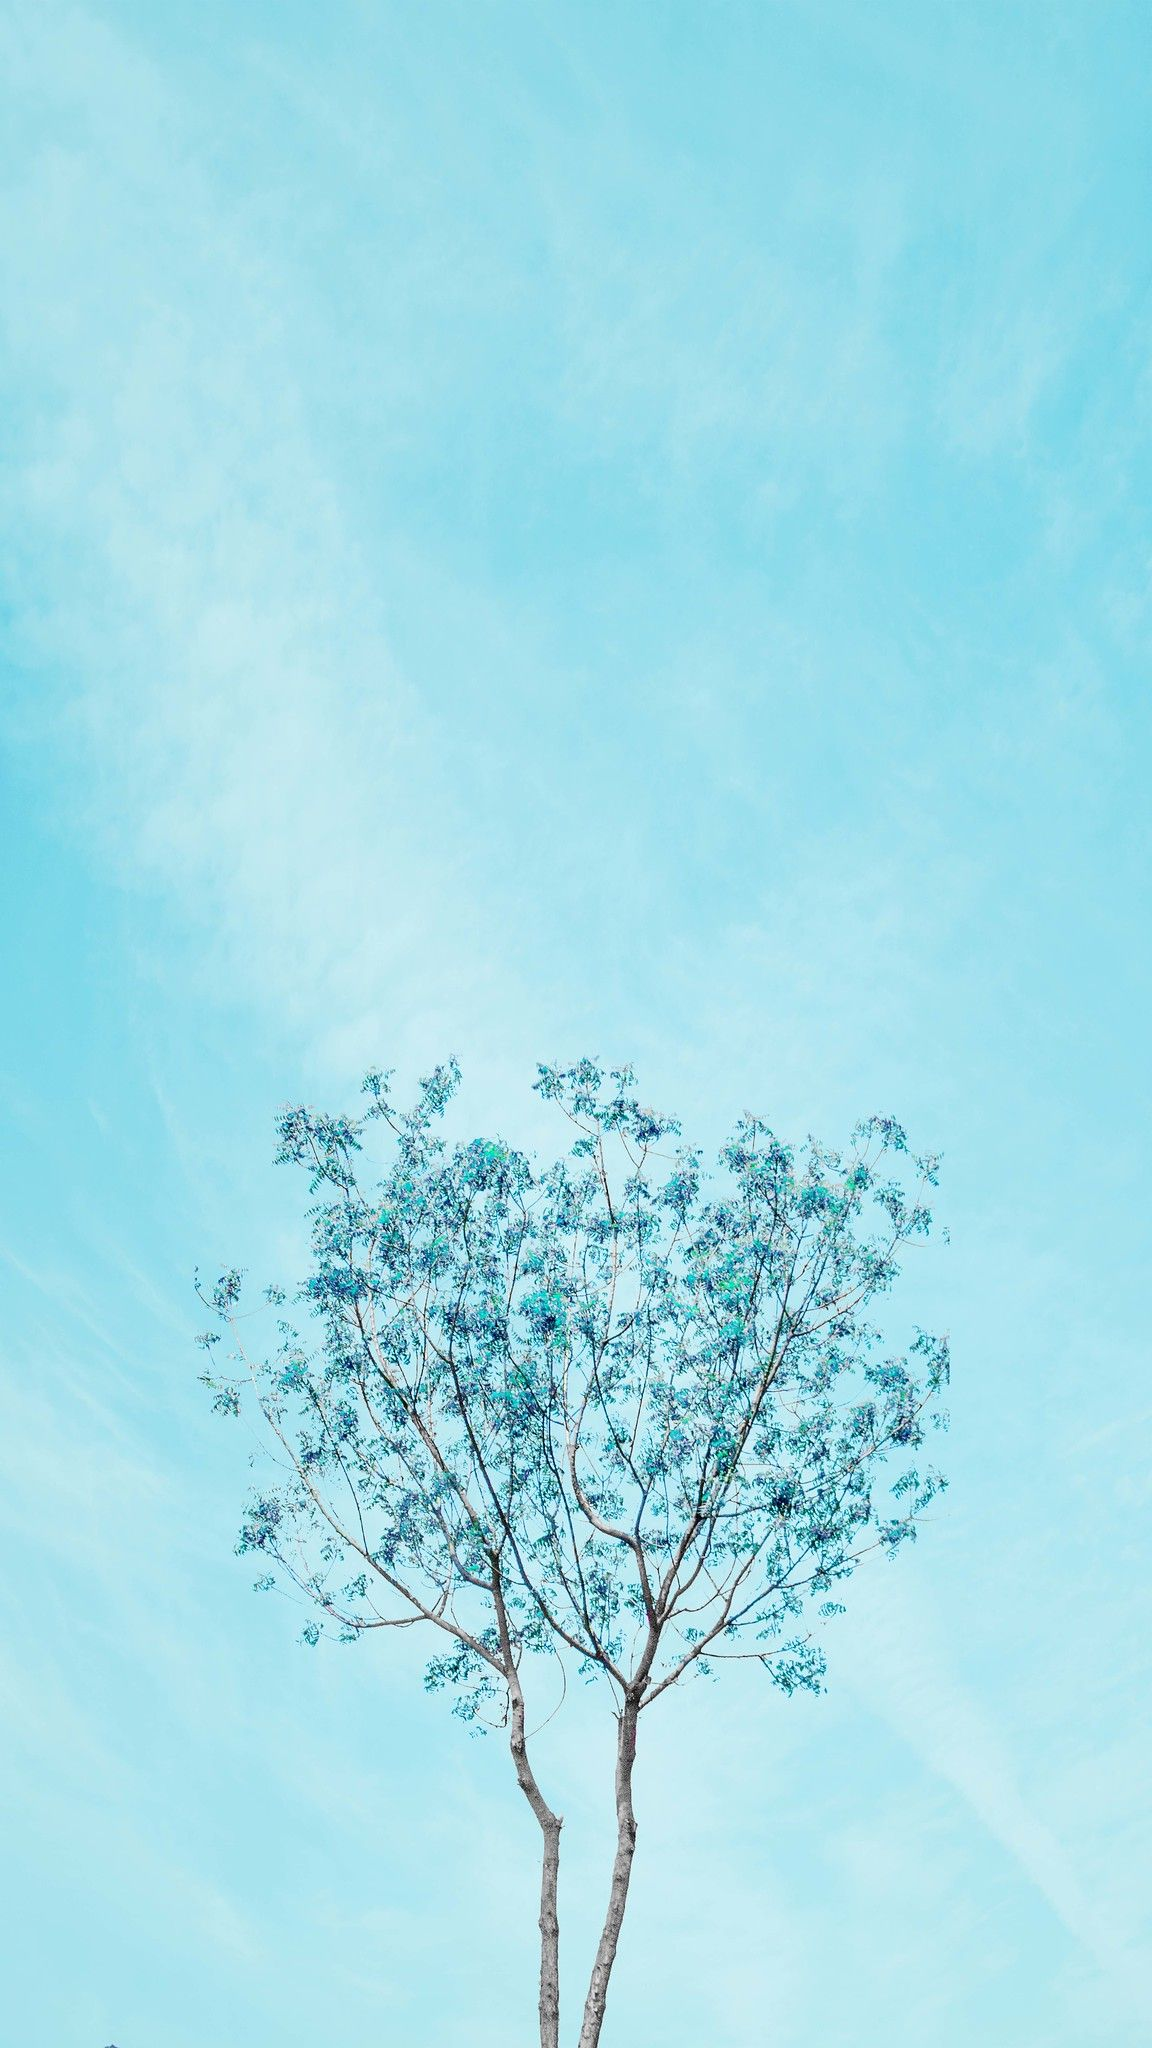 Pin von Meltem Öner auf tumblr wallpaper Frühling